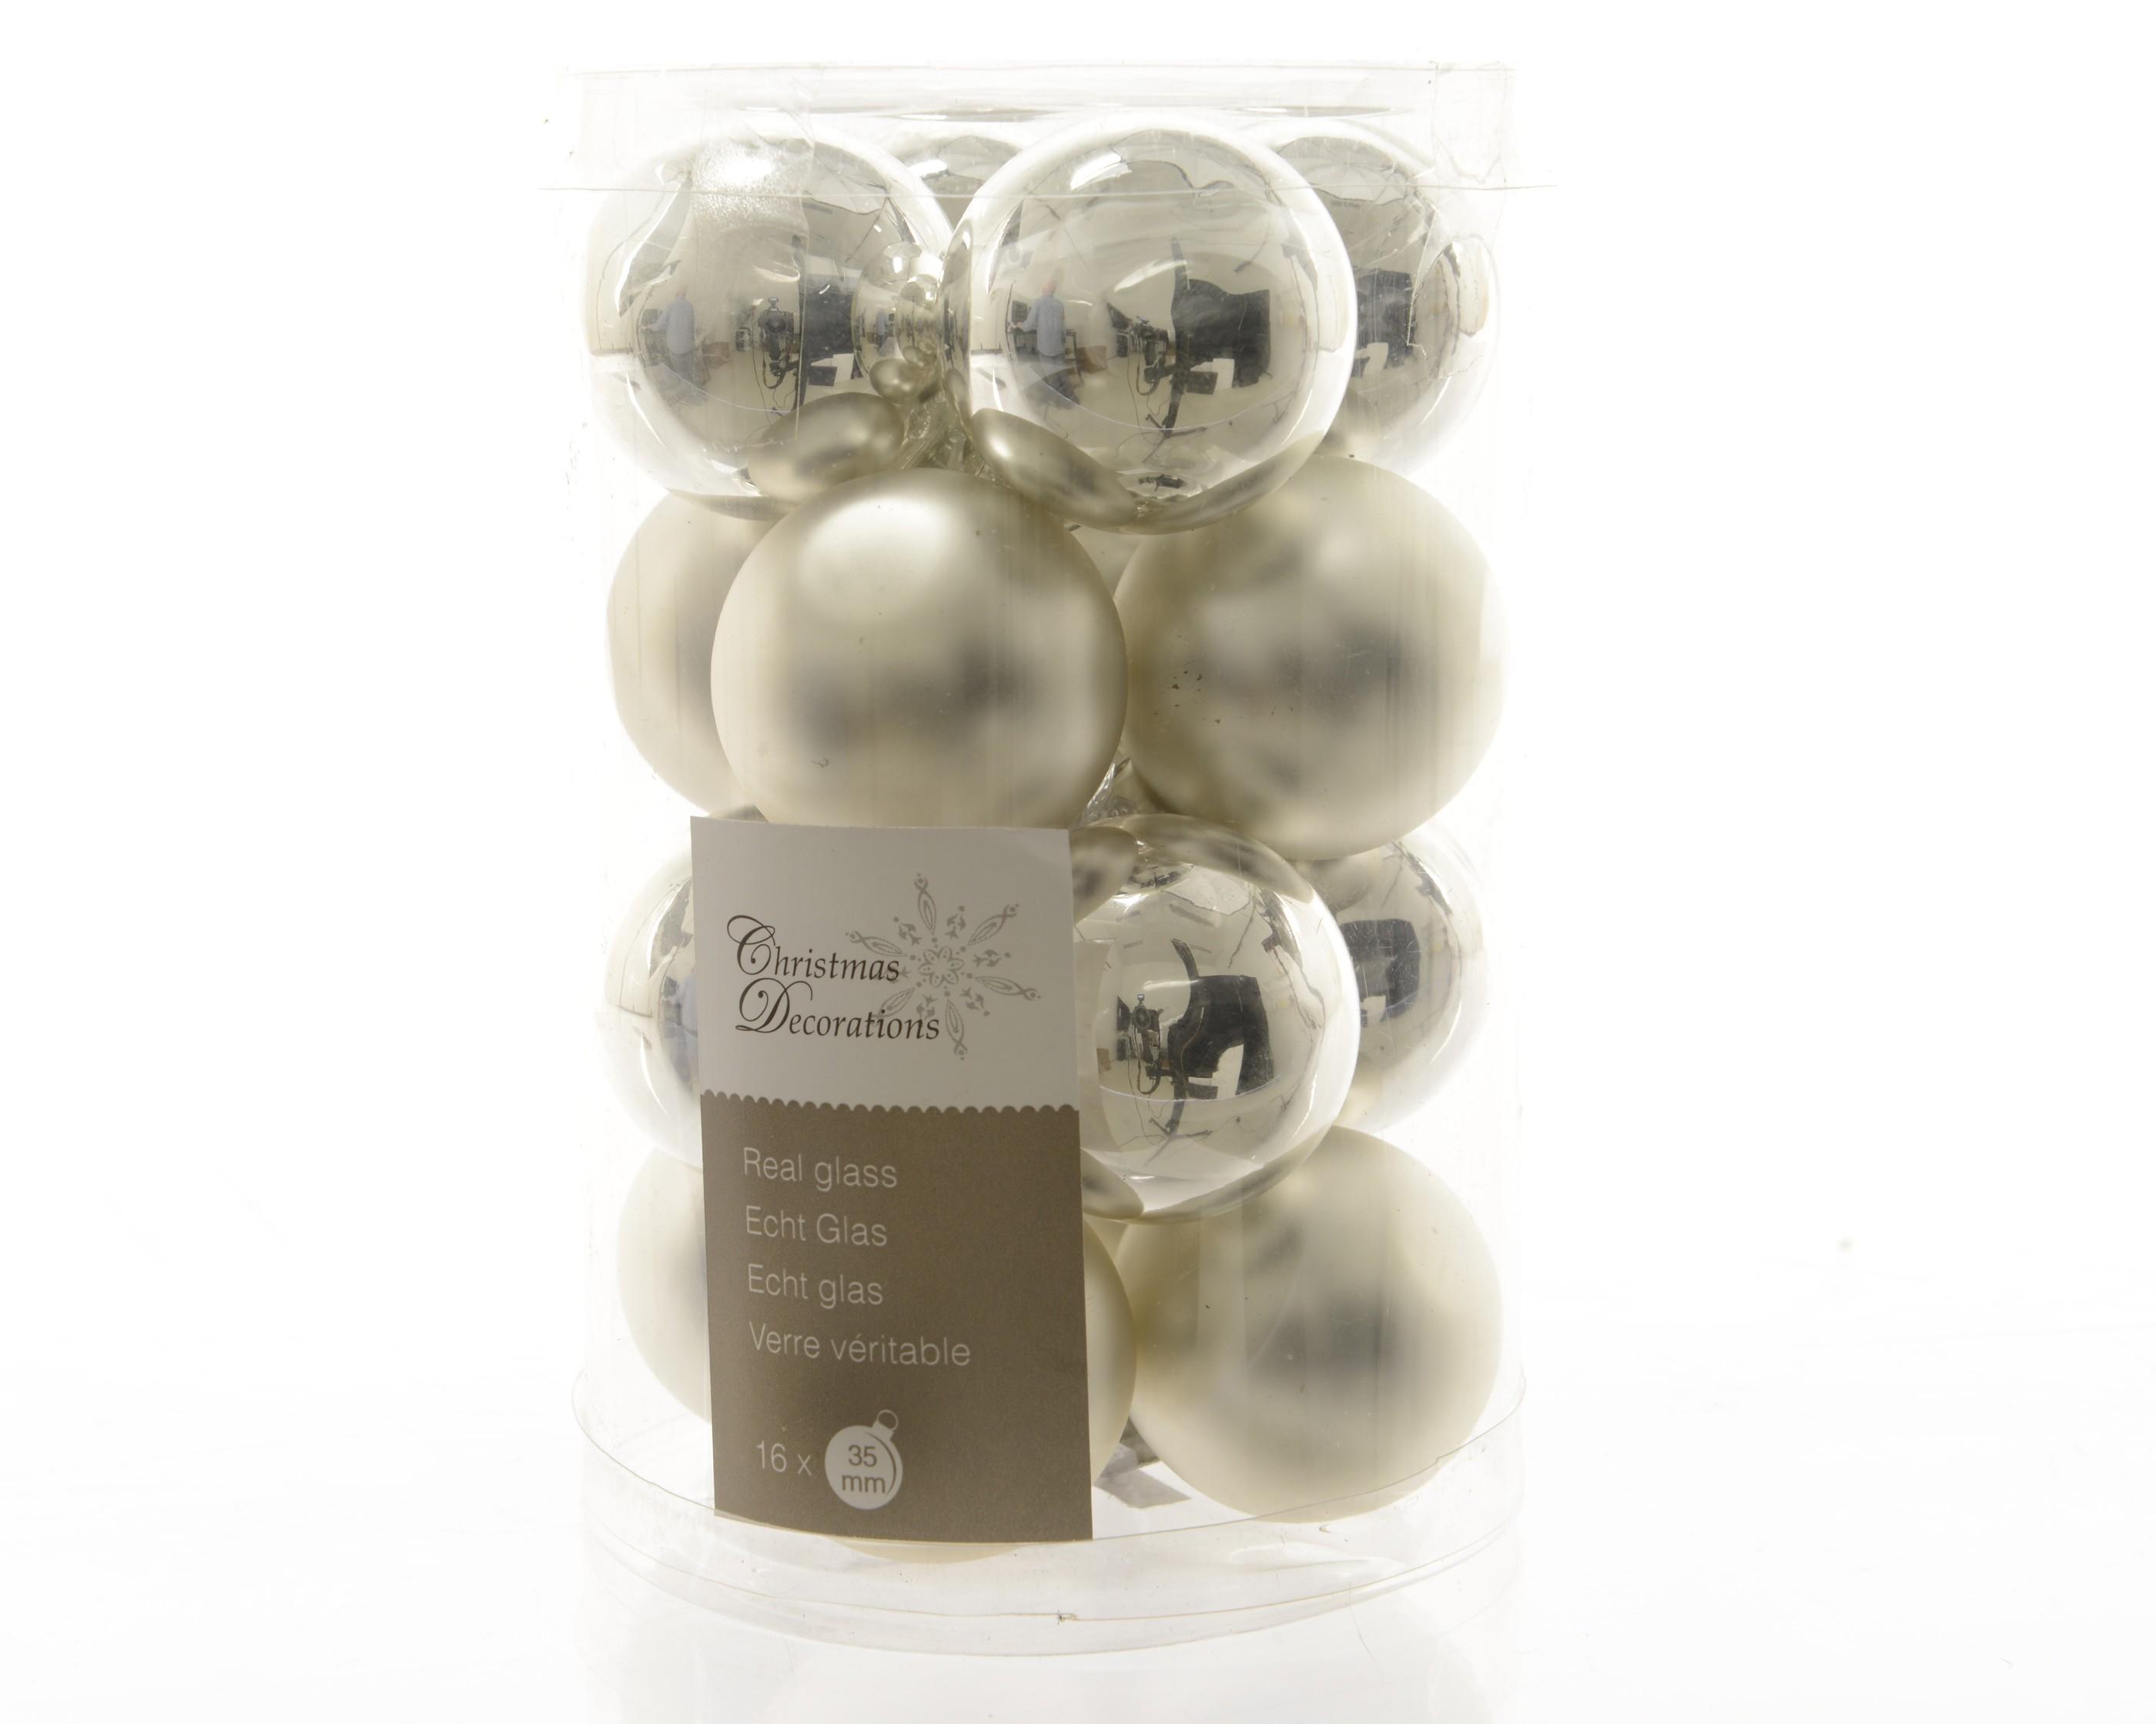 christbaumschmuck mini weihnachtskugeln glas silber. Black Bedroom Furniture Sets. Home Design Ideas